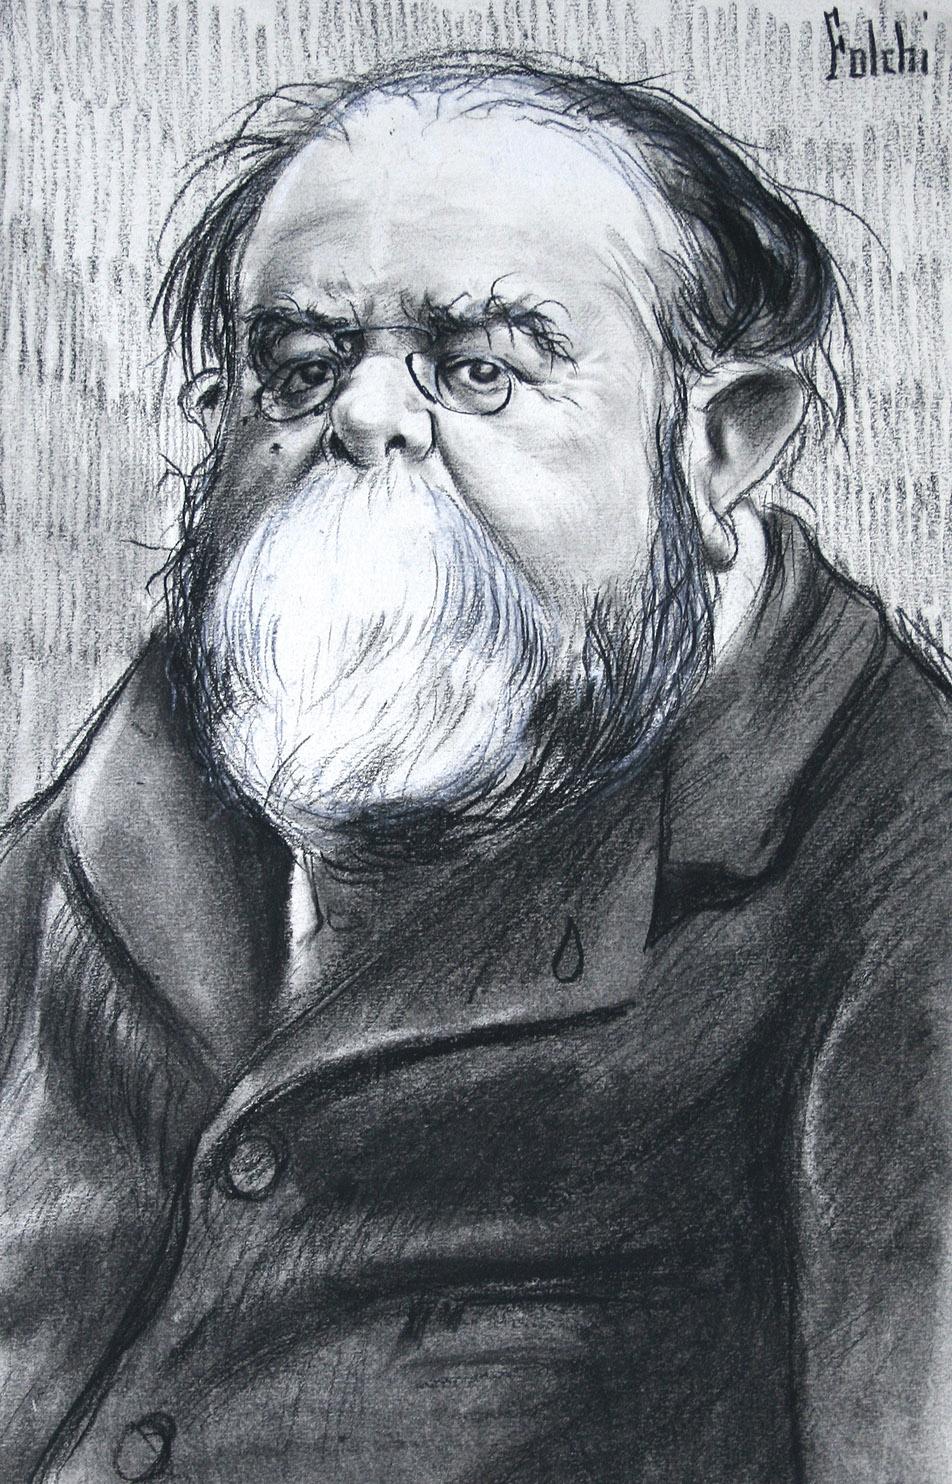 Caricatura de Teodoro Llorente Olivares por Folchi